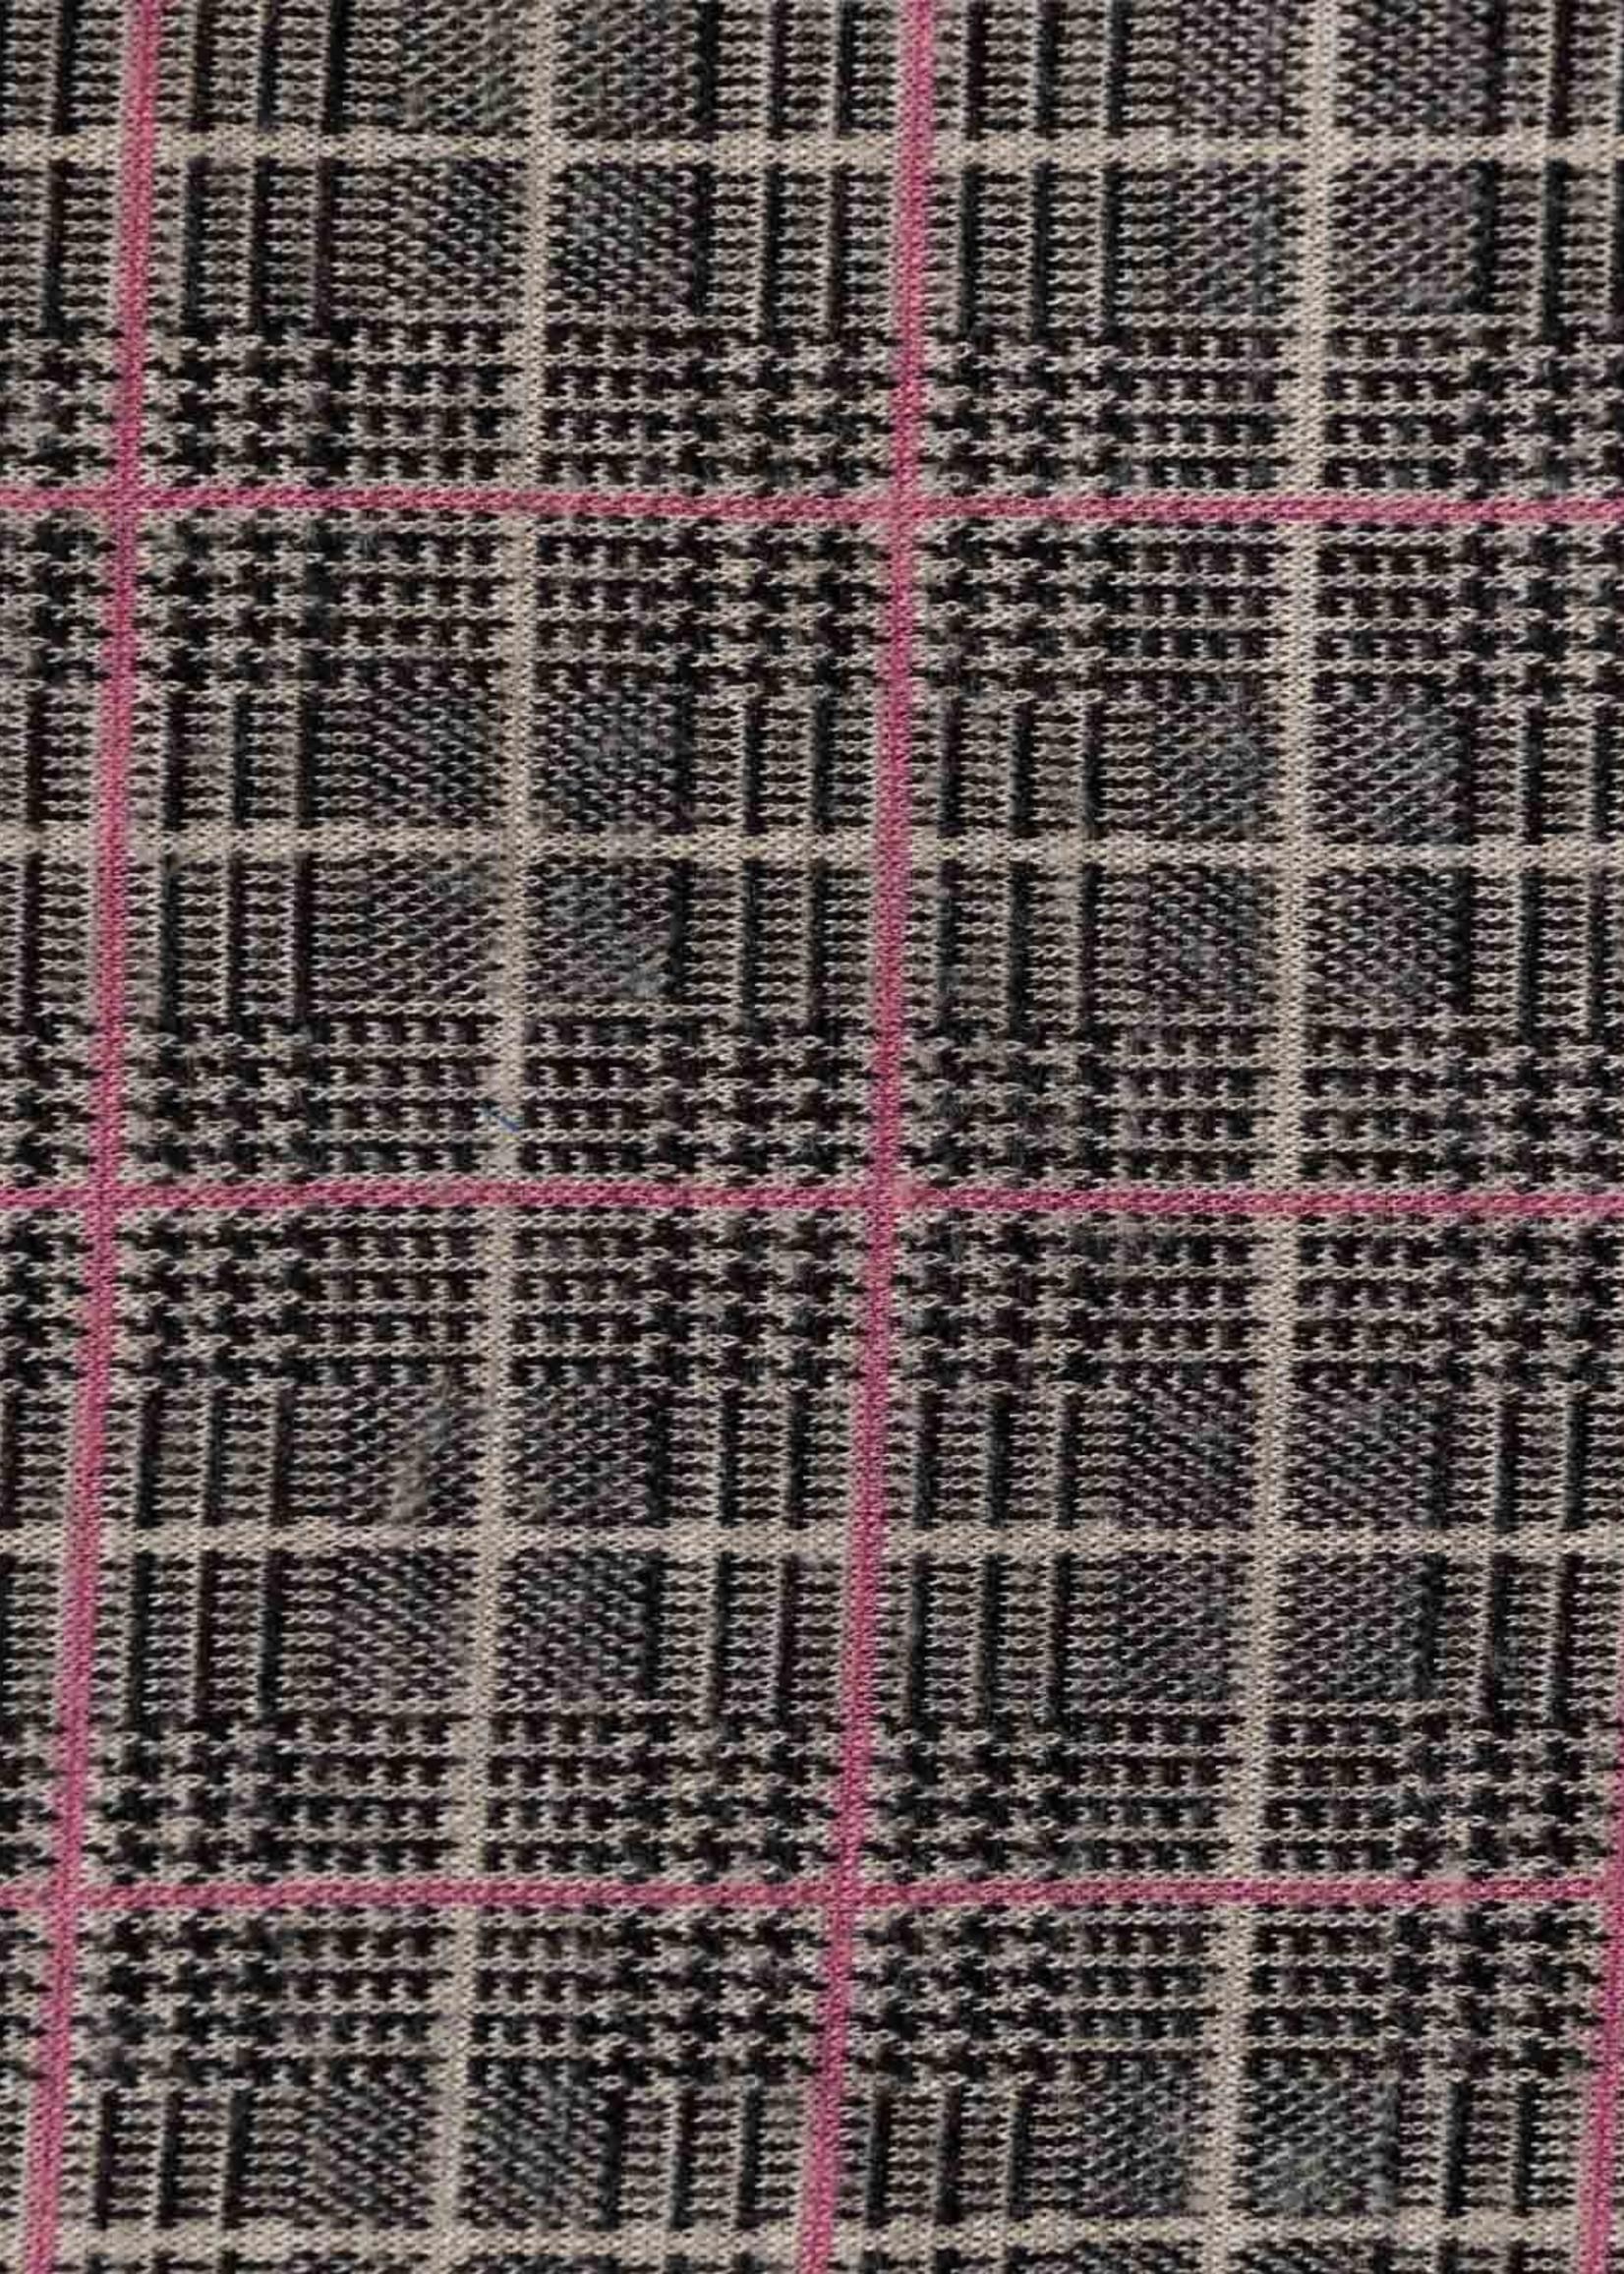 Katia Fabrics SOFT KNIT GALES AUTUMN